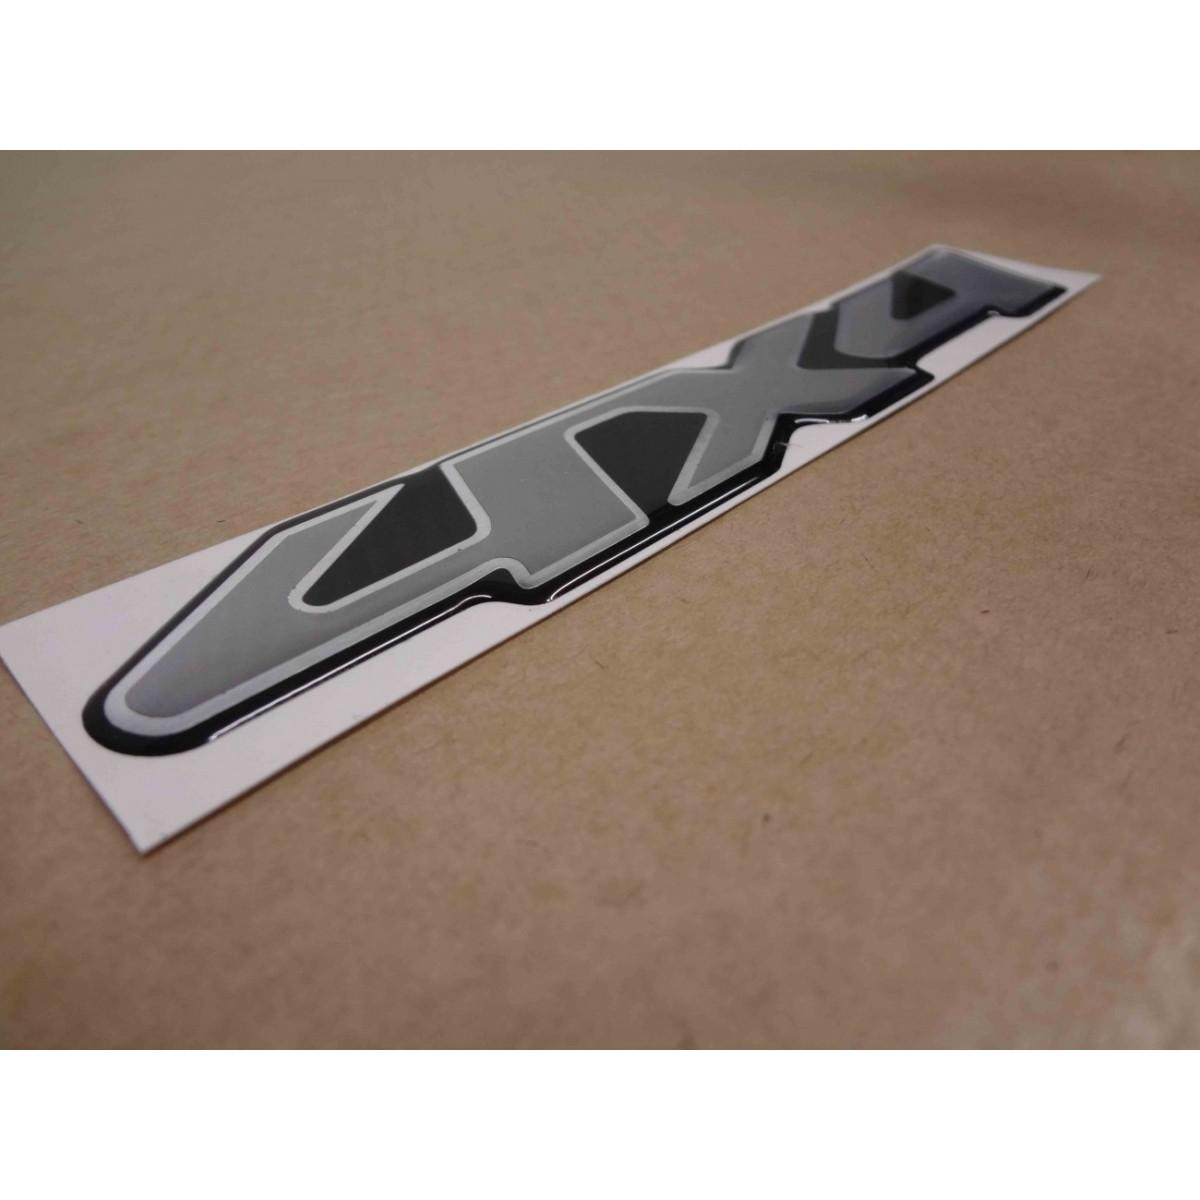 Adesivo Emblema Tracker 4x4 Resinado Trk02